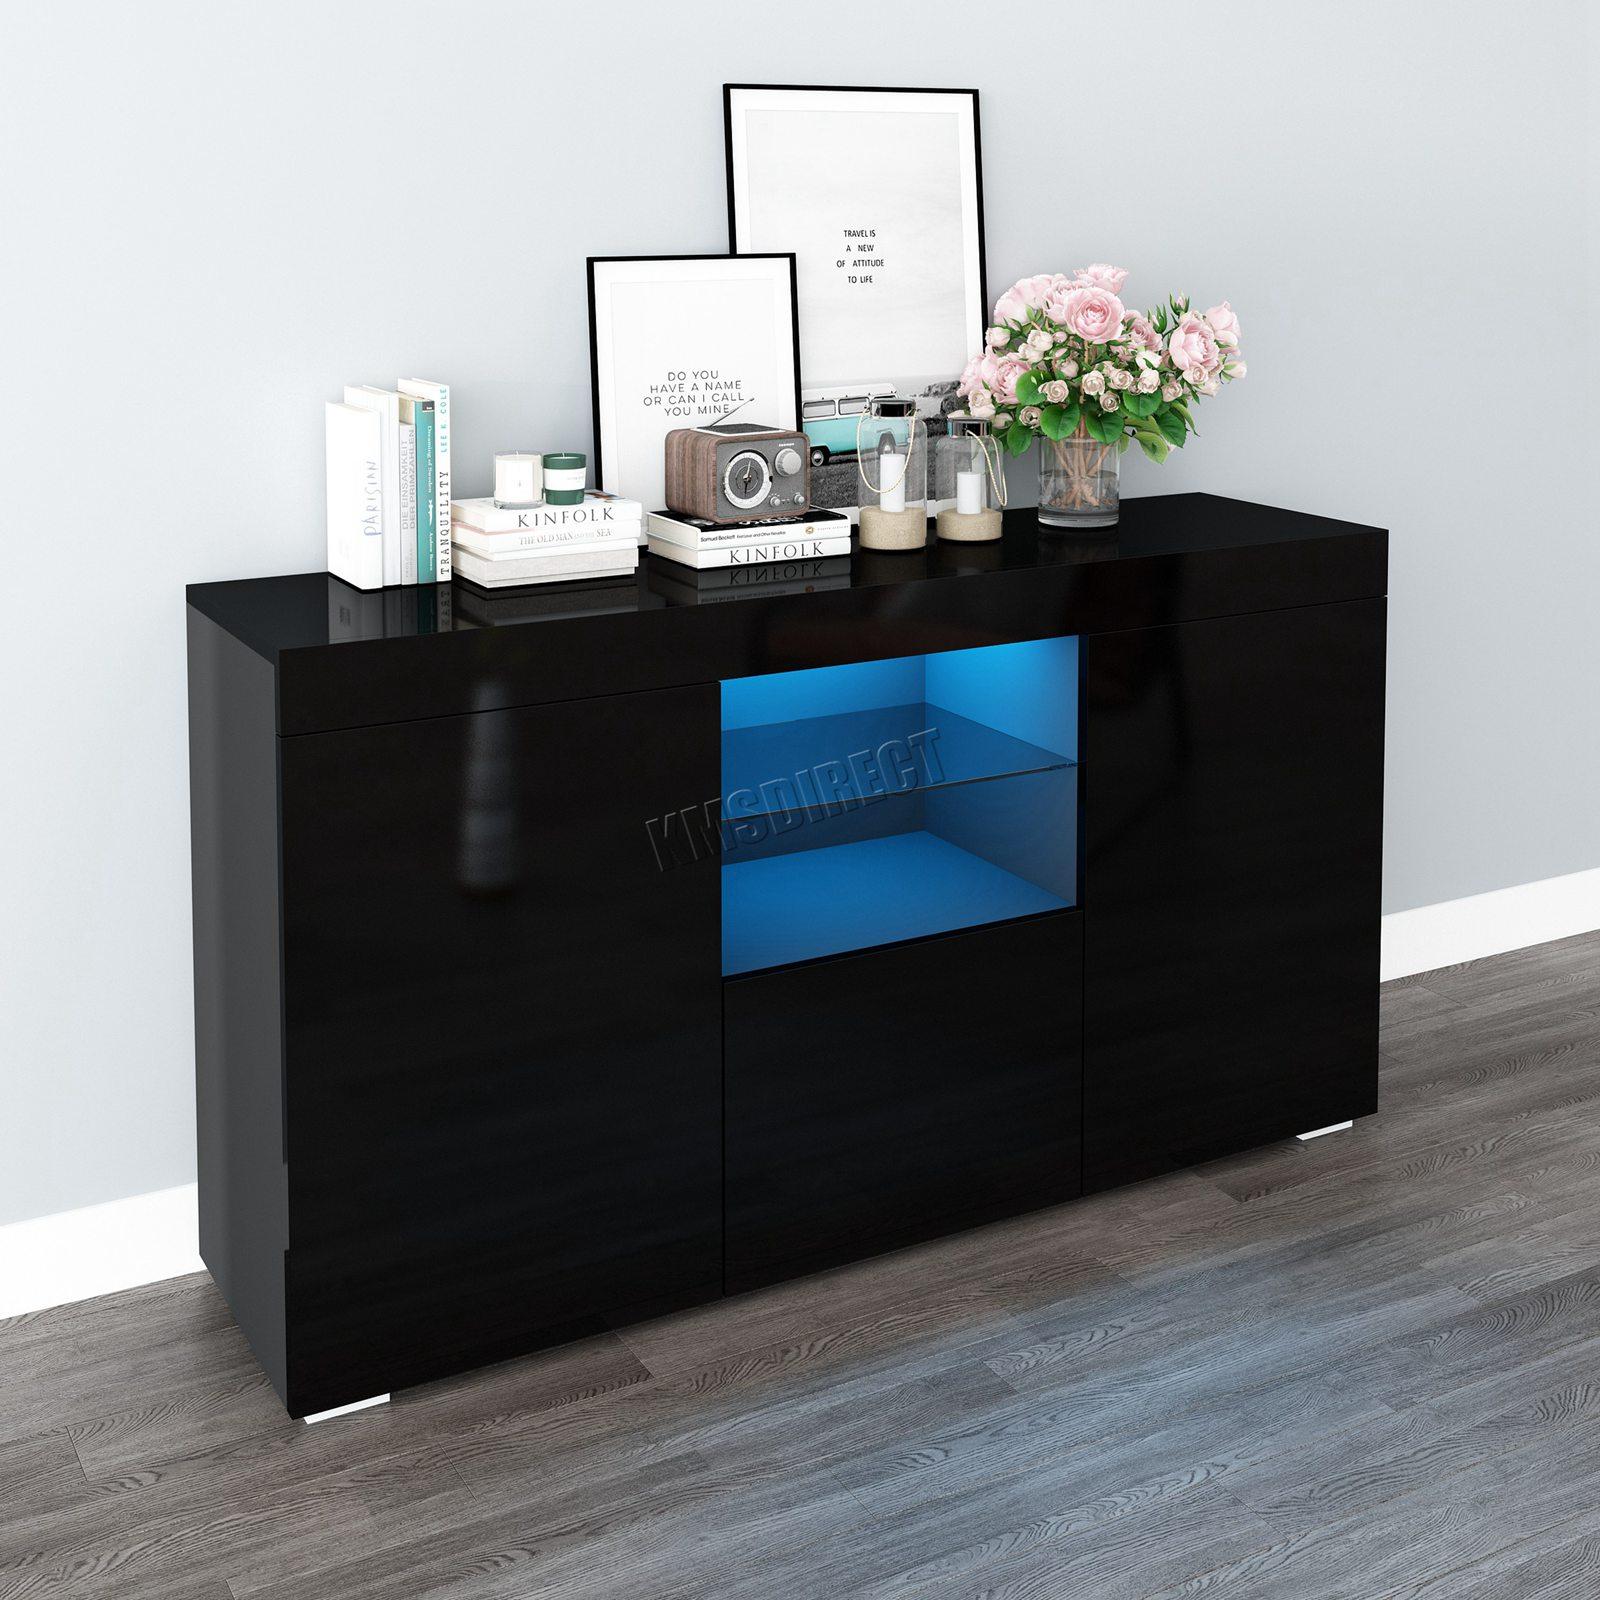 WestWood-PB-High-Gloss-Cabinet-LED-Bookshelf-Sideboard-Cupboard-Home-Unit-PHC03 thumbnail 17